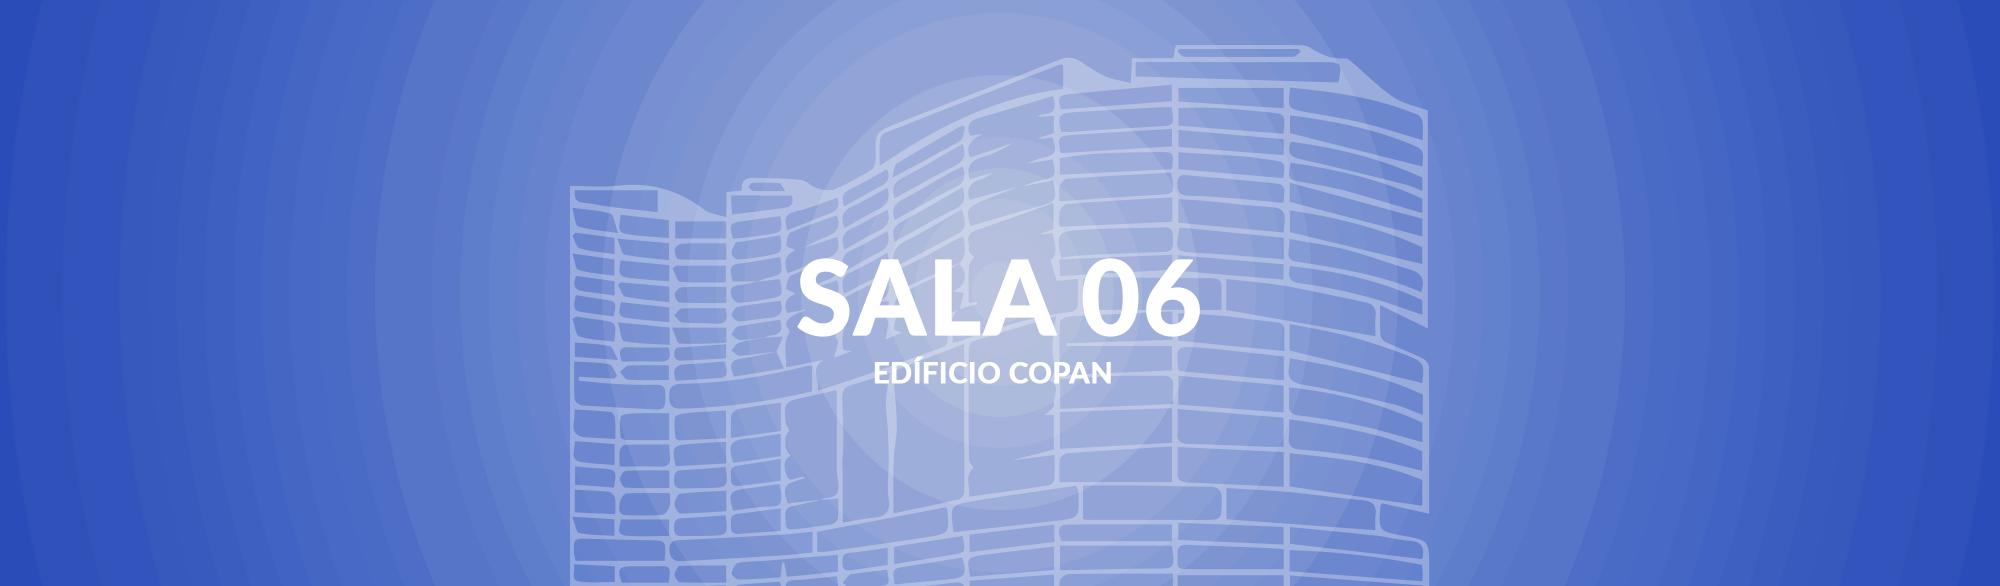 Banner dia02 sala06